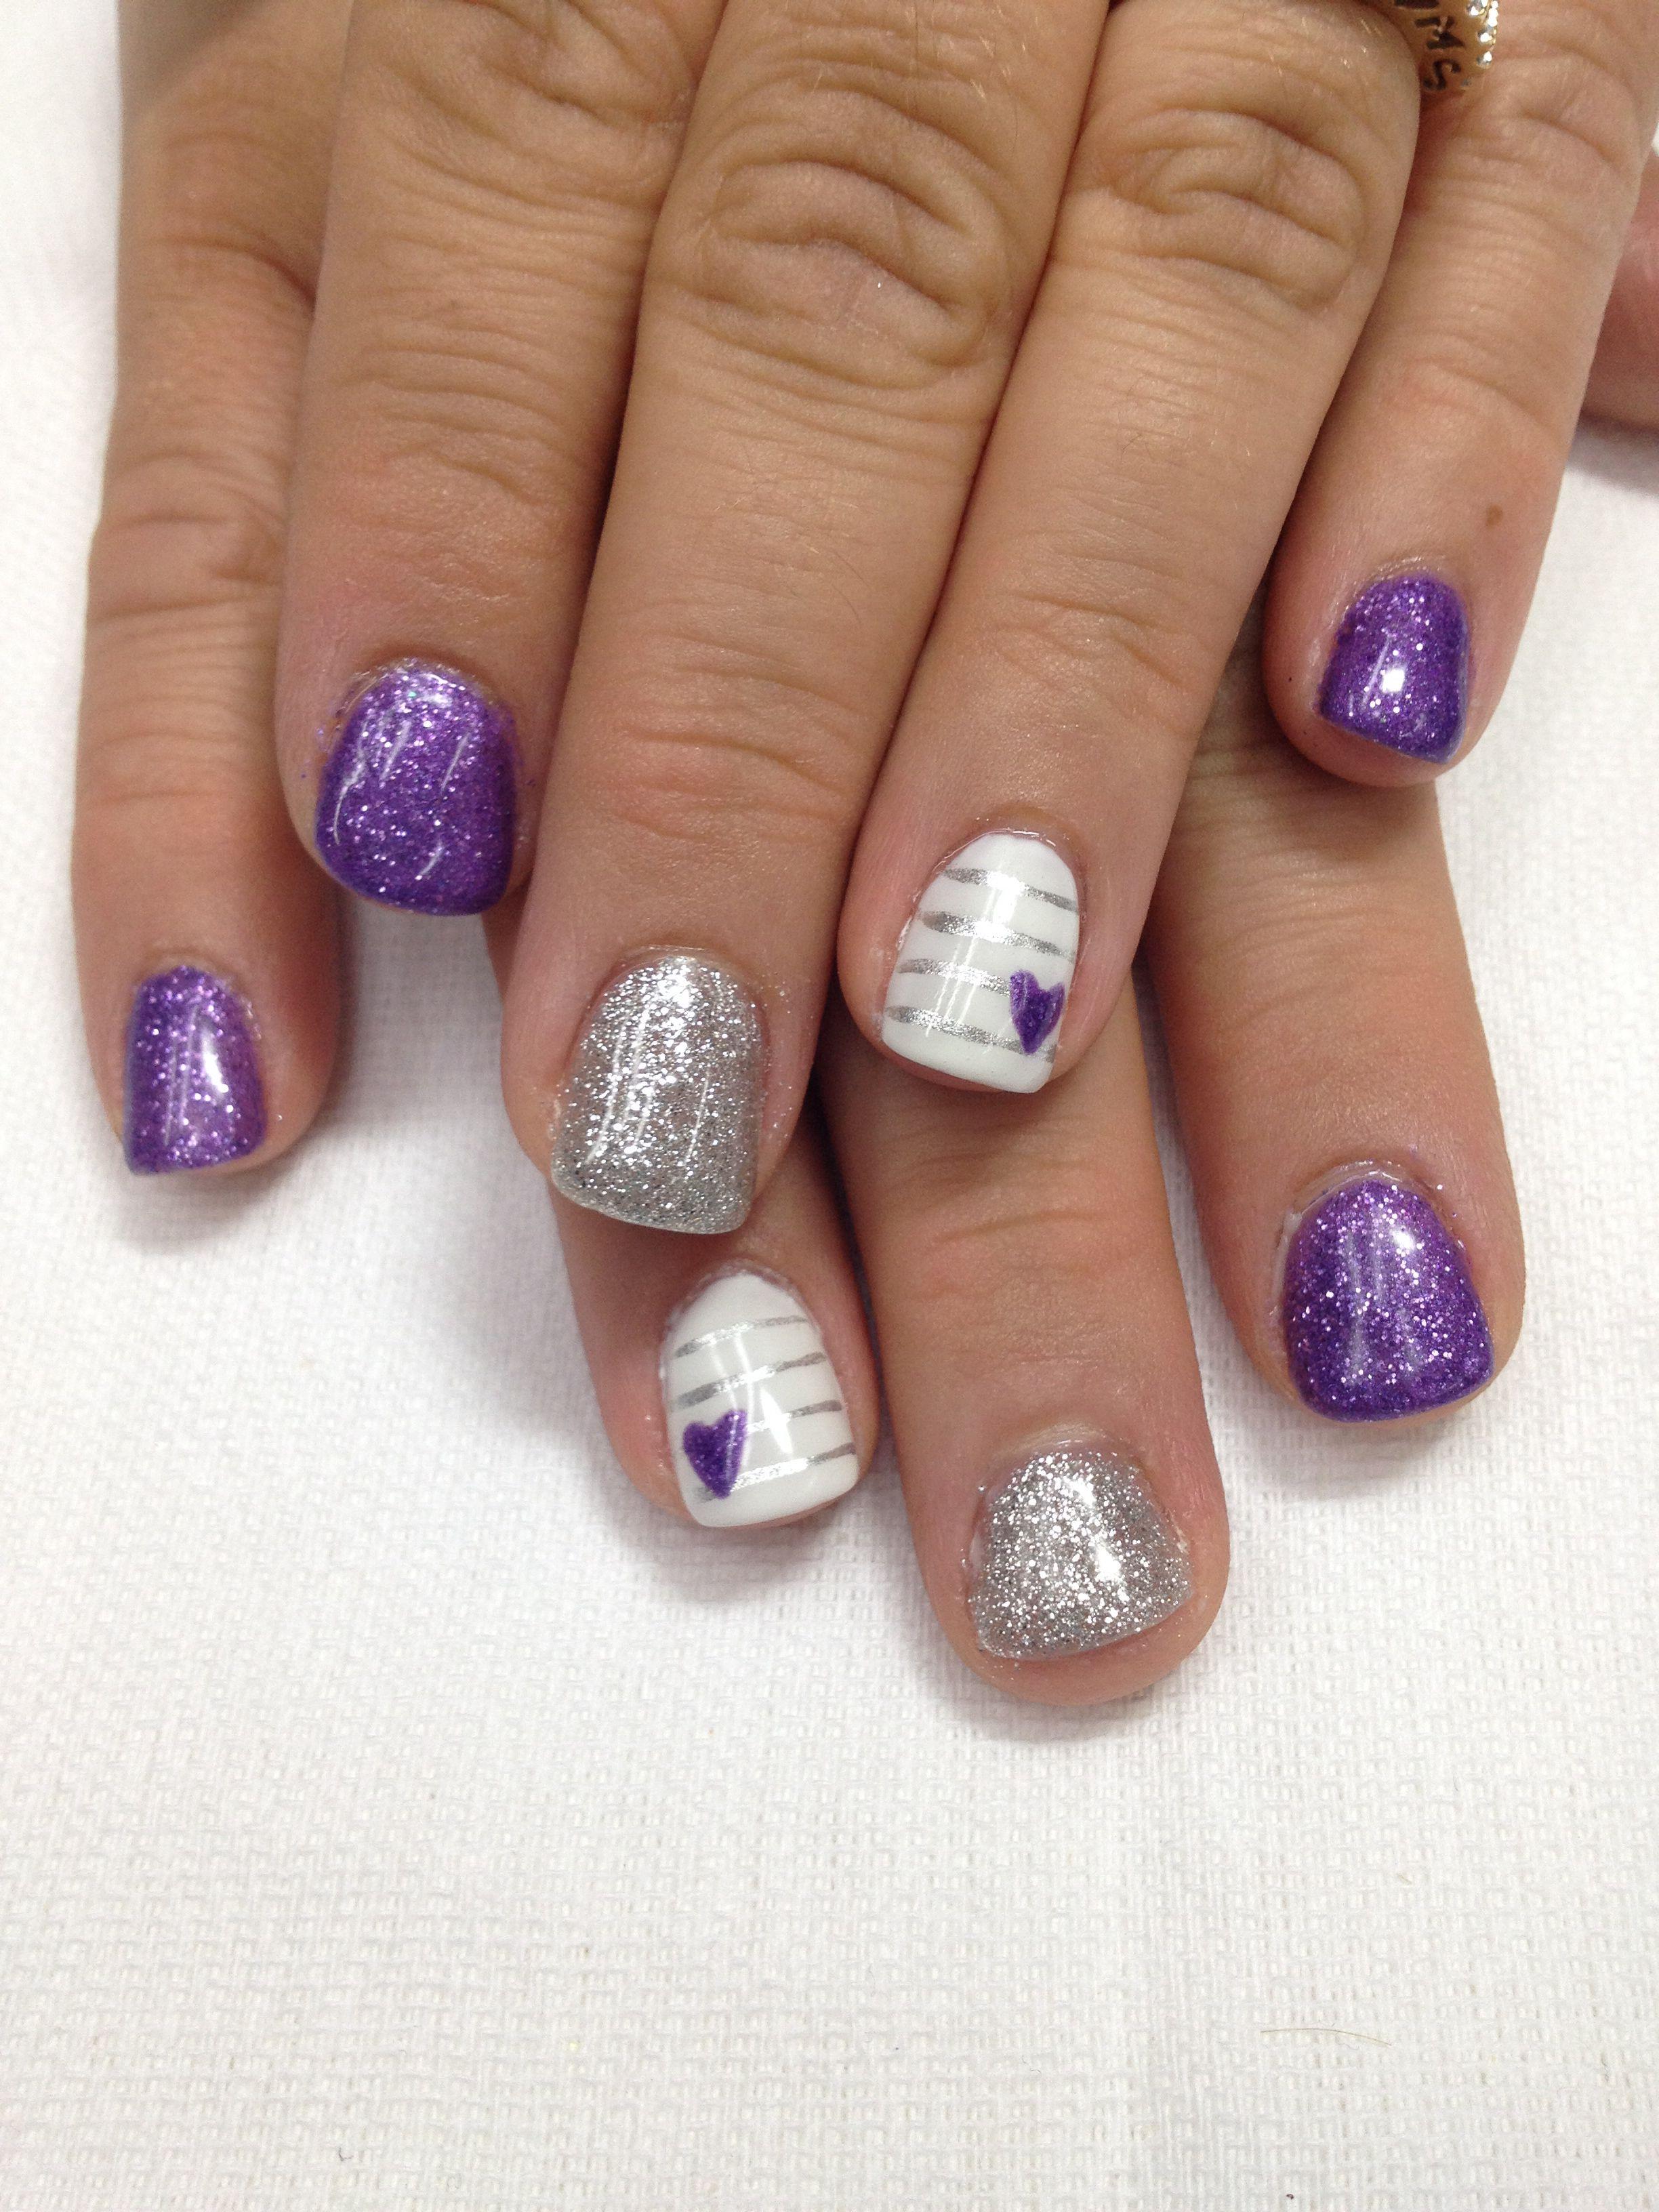 Purple Gel Nails Designs : purple, nails, designs, Designs, Purple, Nails,, Designs,, Nails